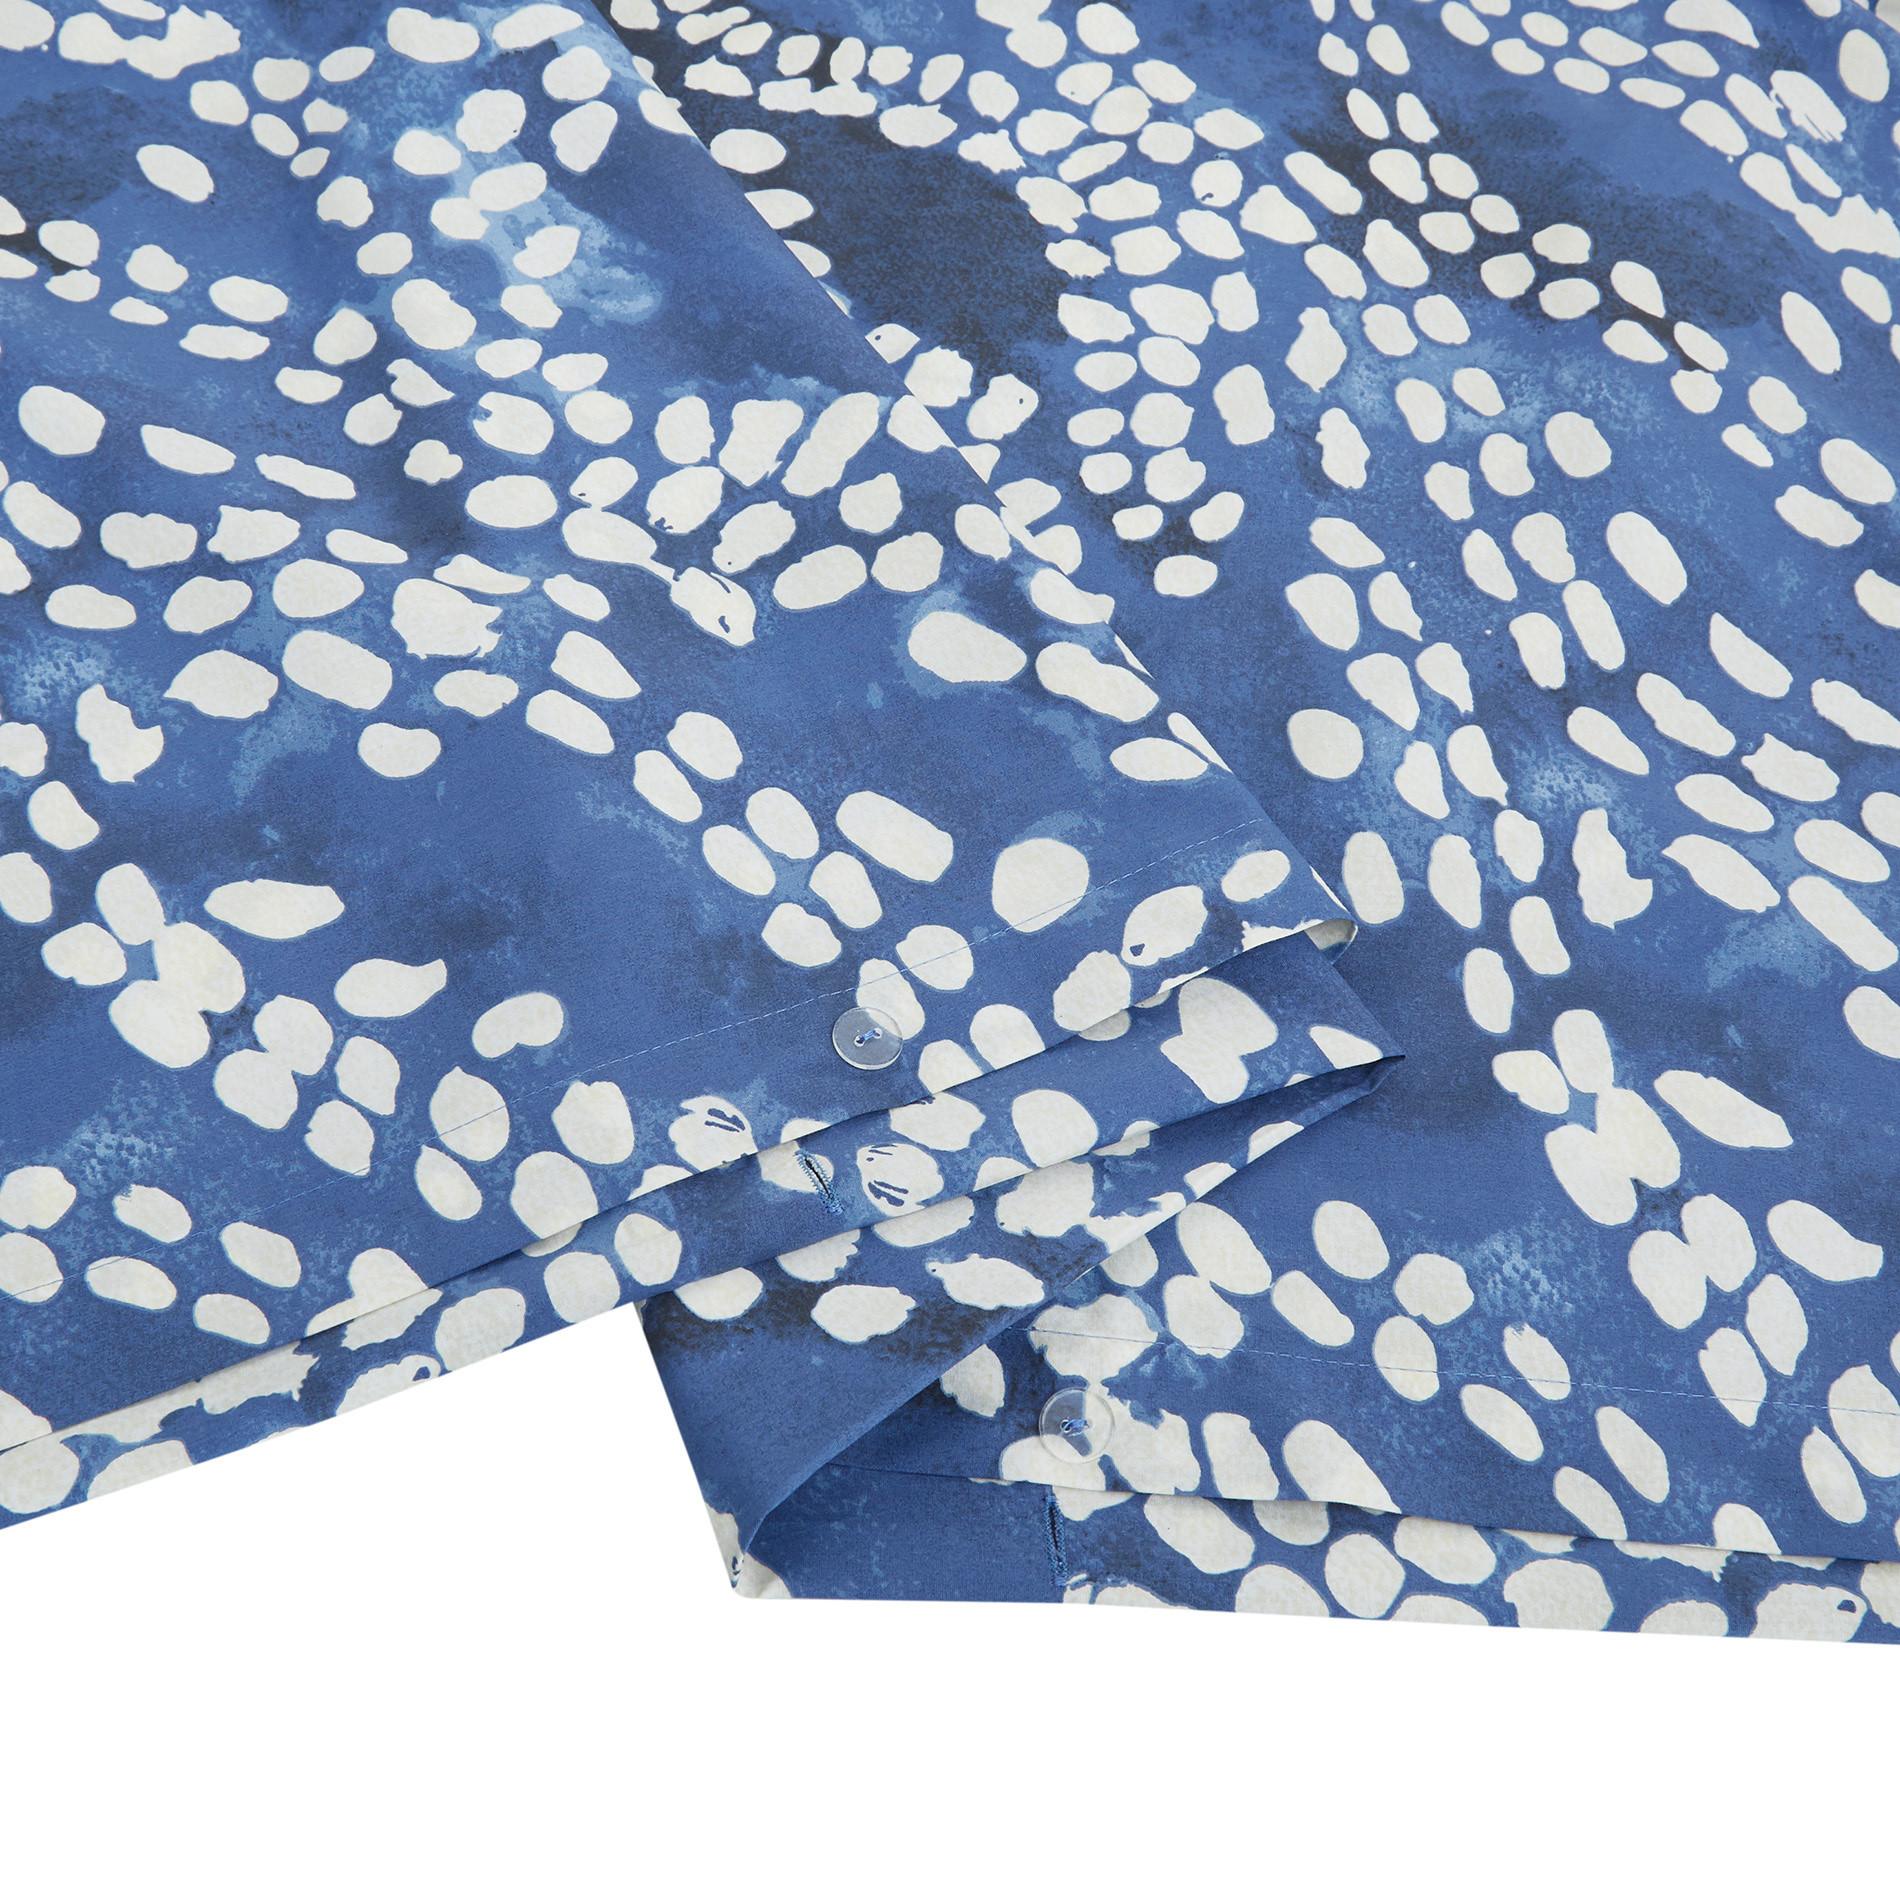 Copripiumino cotone percalle fantasia a puntini, Blu, large image number 3